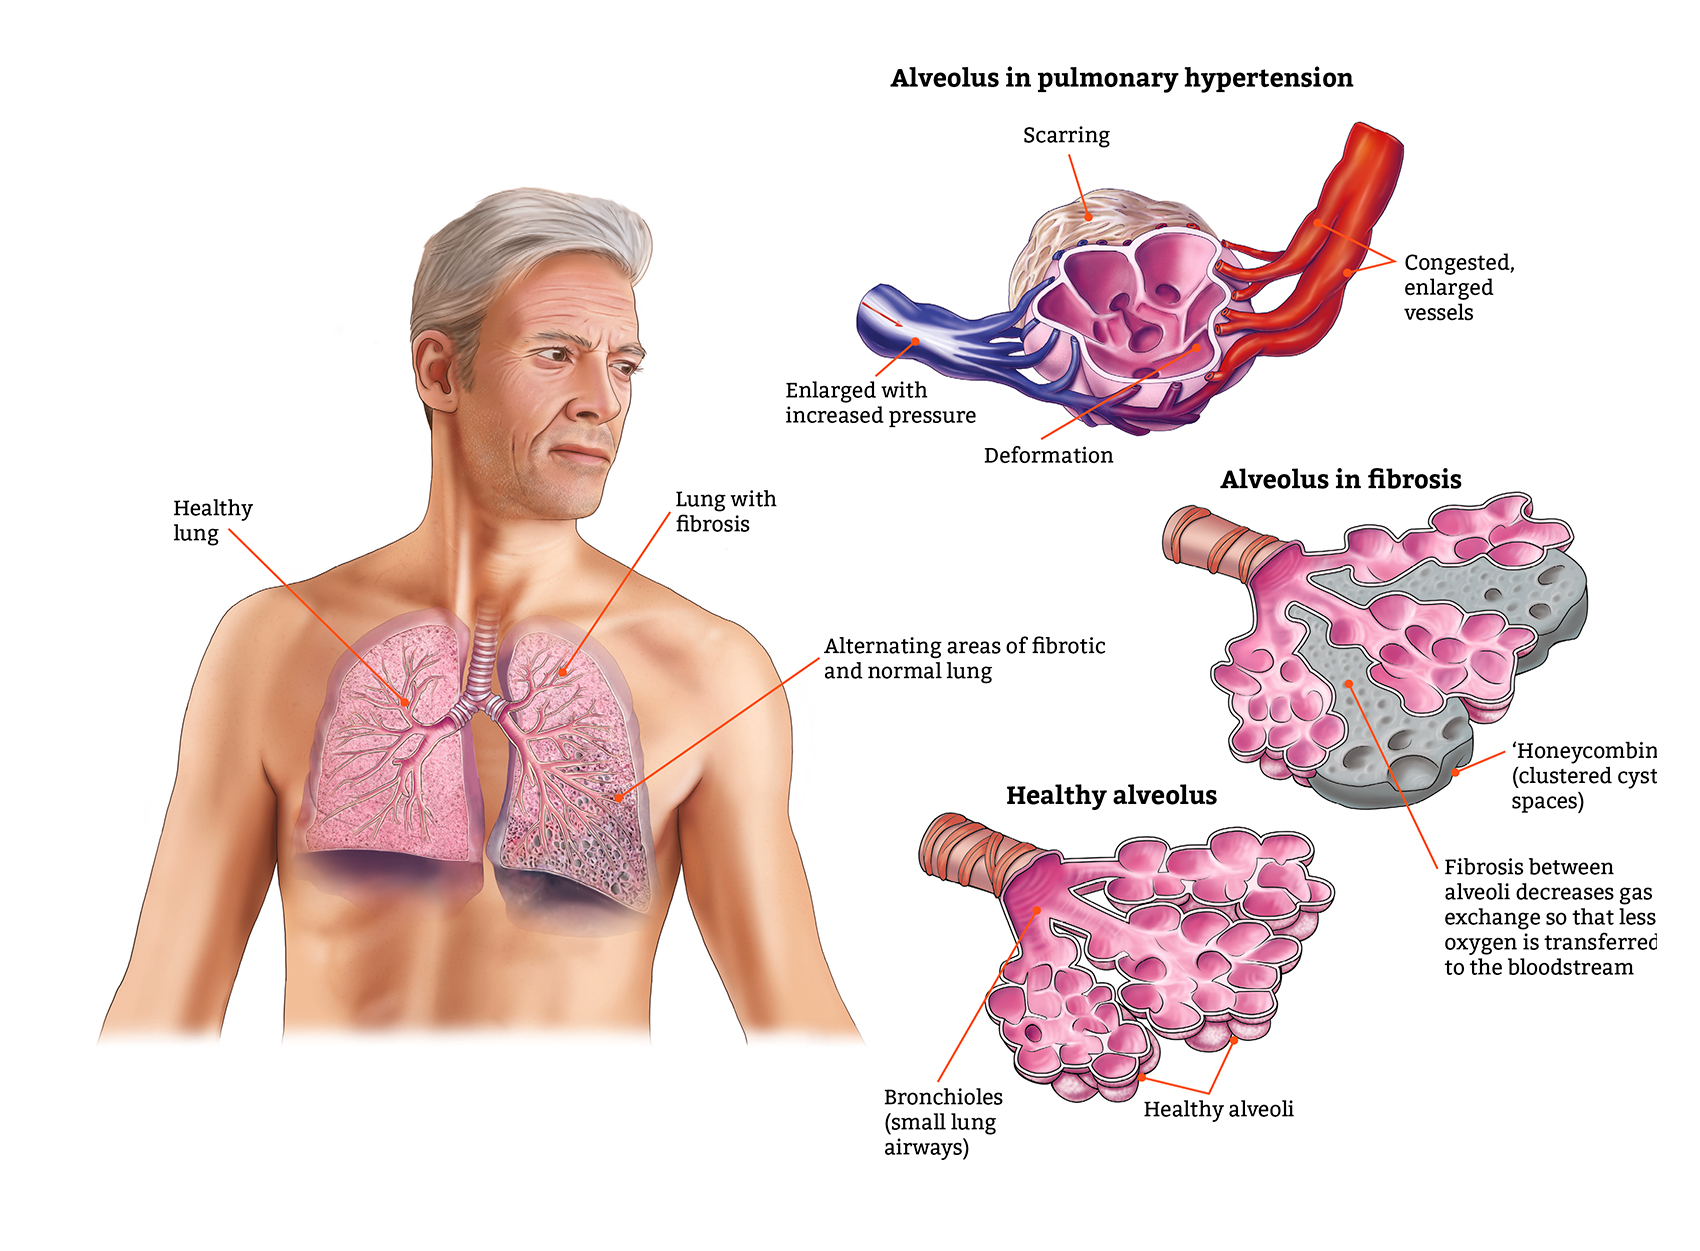 https://vicorepharma.com/wp-content/uploads/2019/05/tabs-2-and-6-illustration-fibrotic-lung-disease.jpg